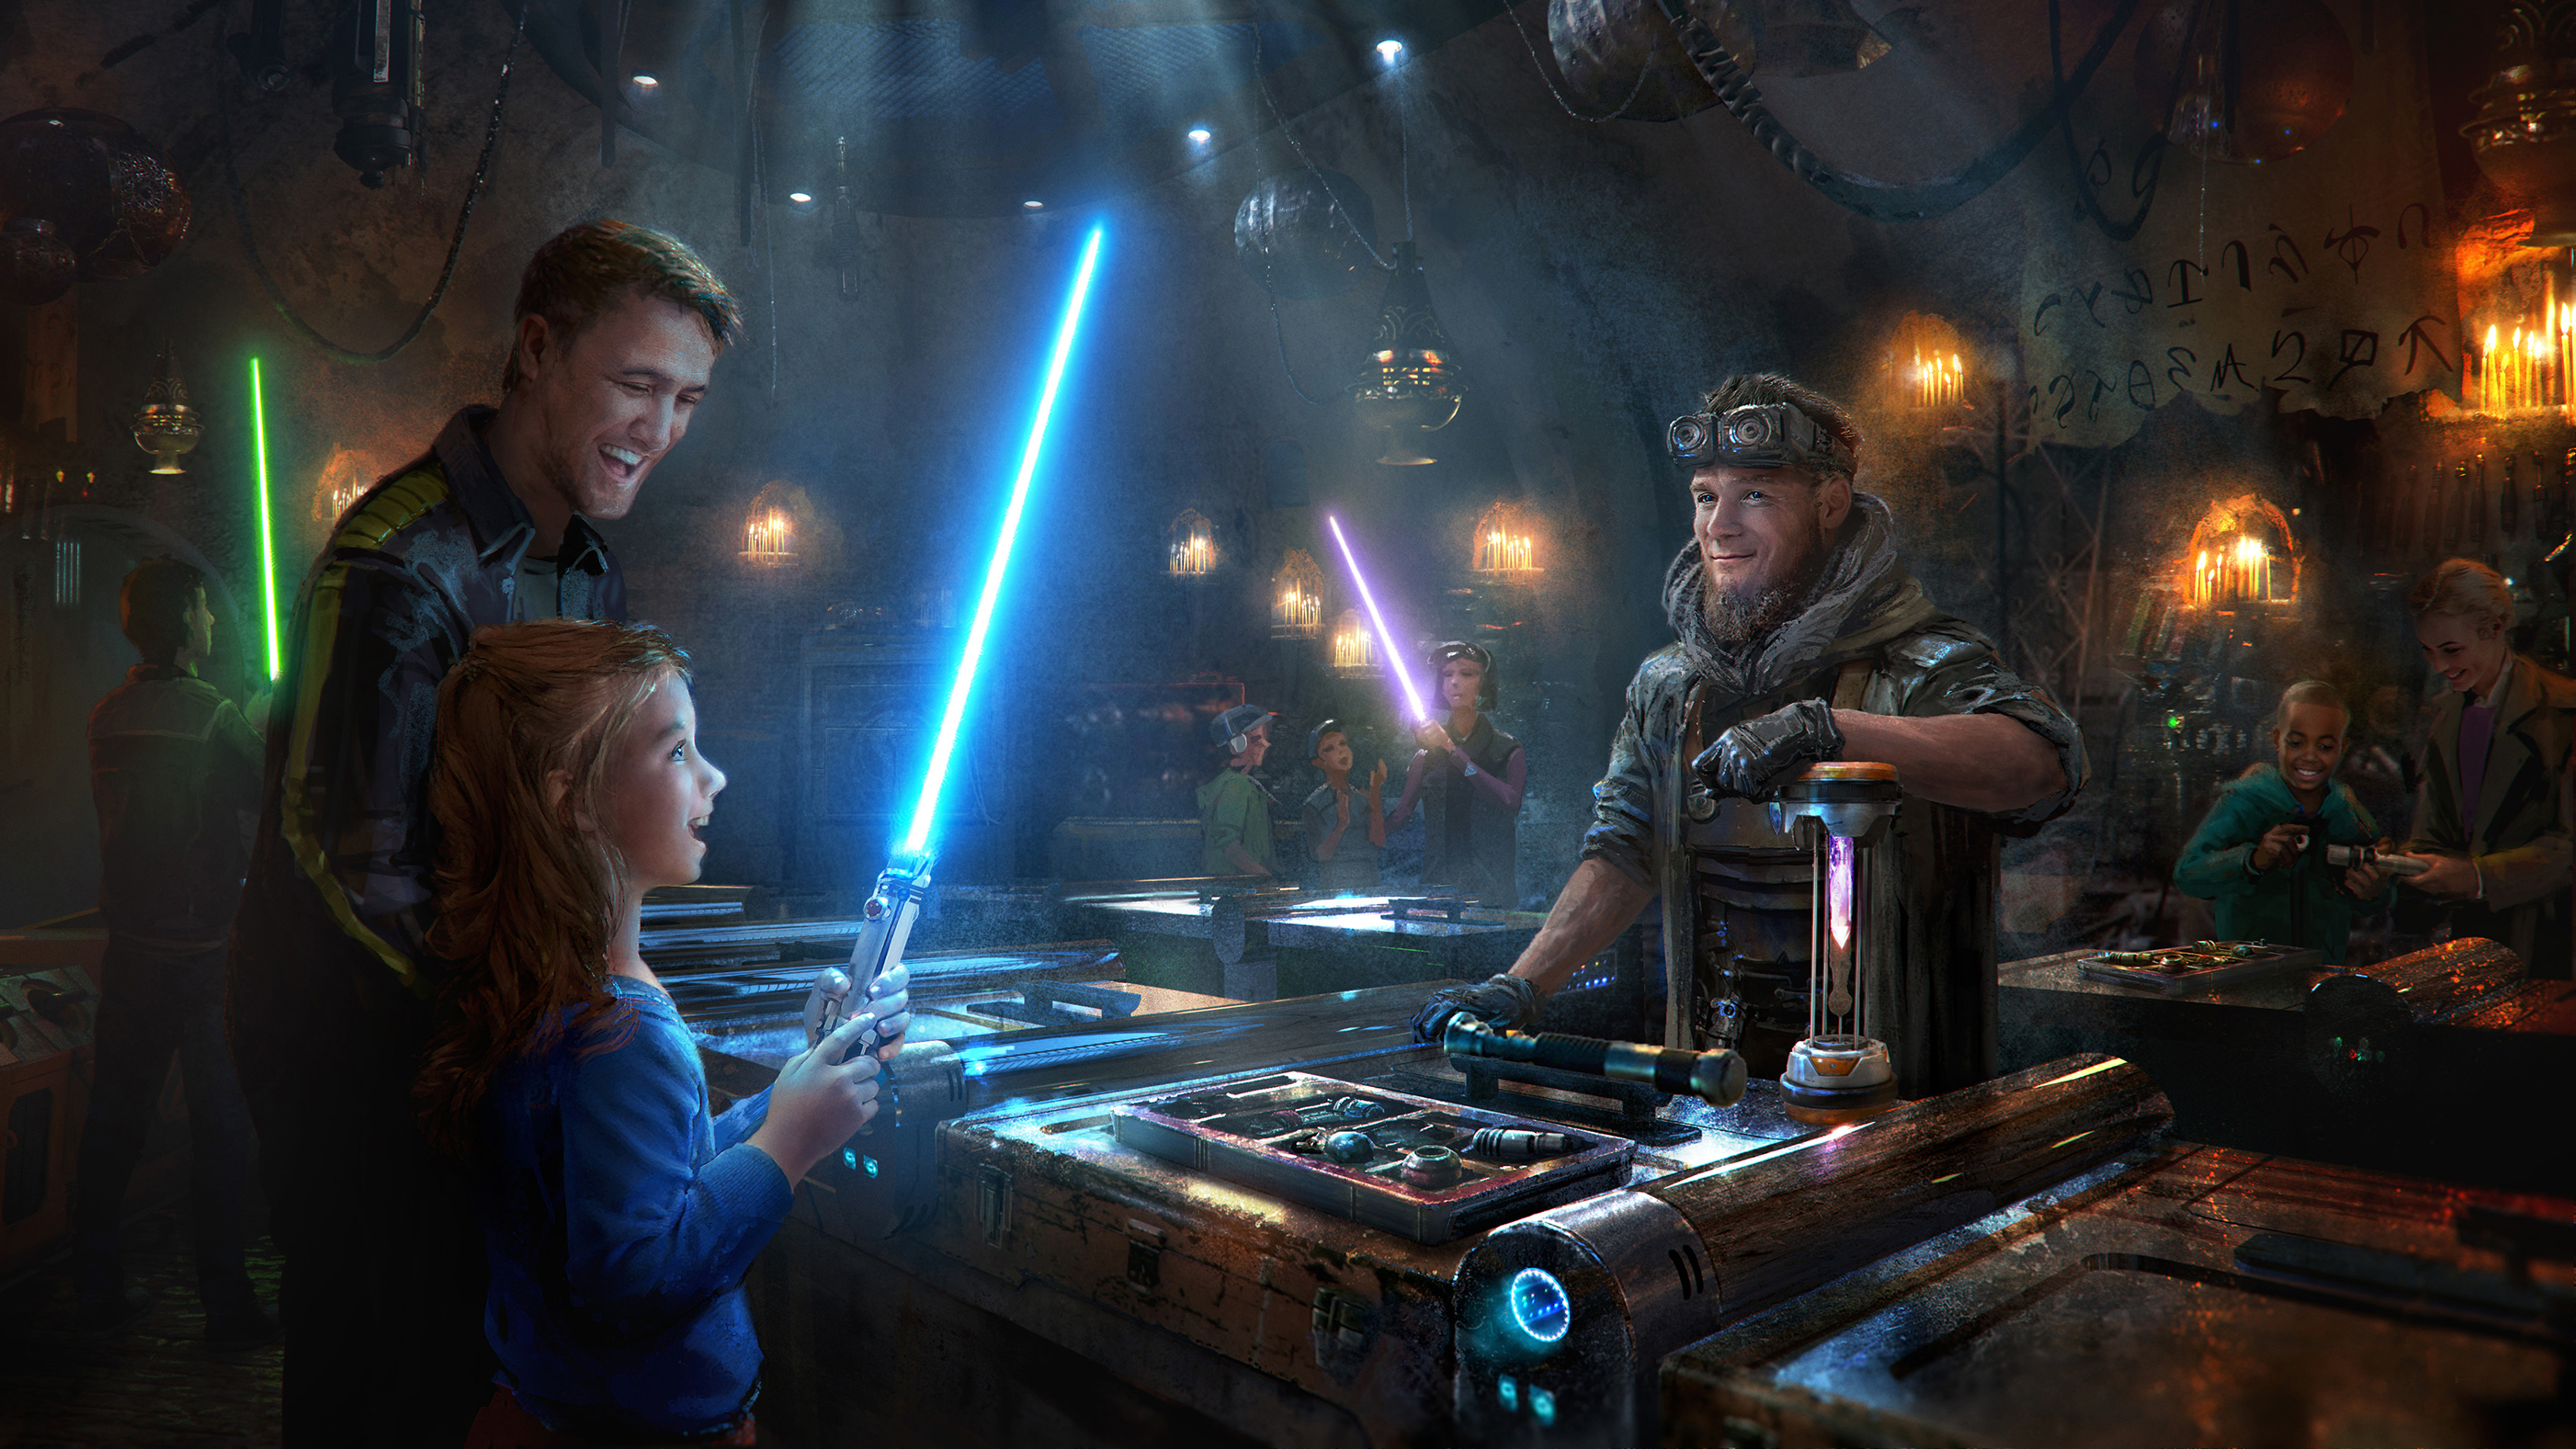 Disney's 'Star Wars' lands coming to a galaxy near you   CNN Travel